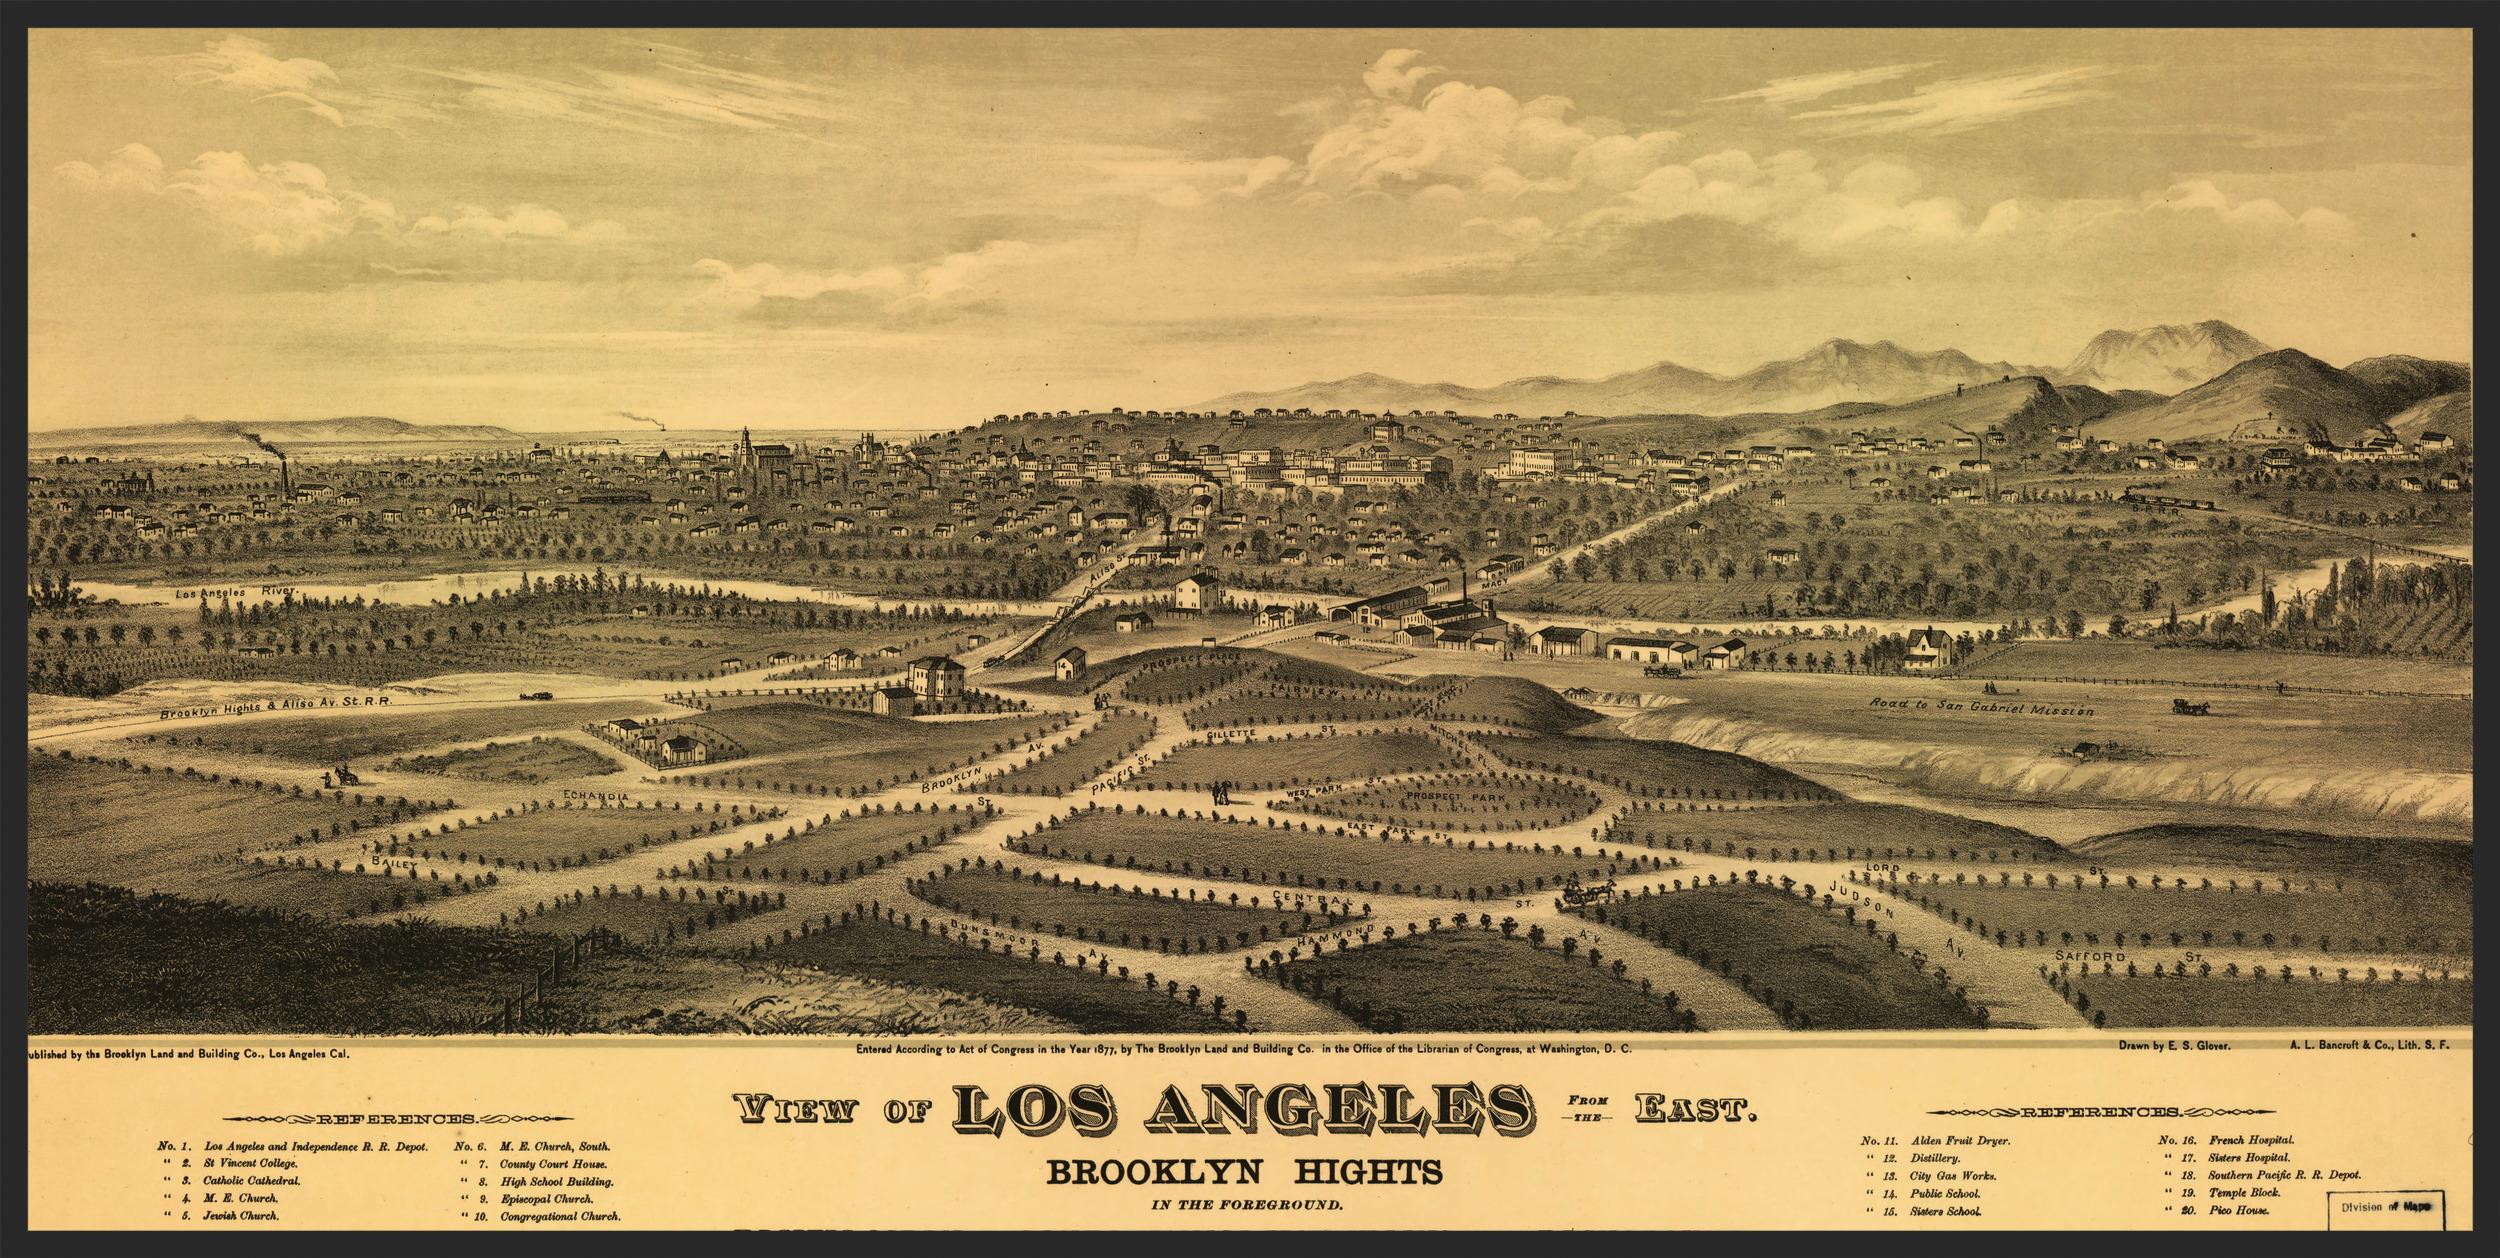 Los Angeles Basin,E.S. Glover - 1877